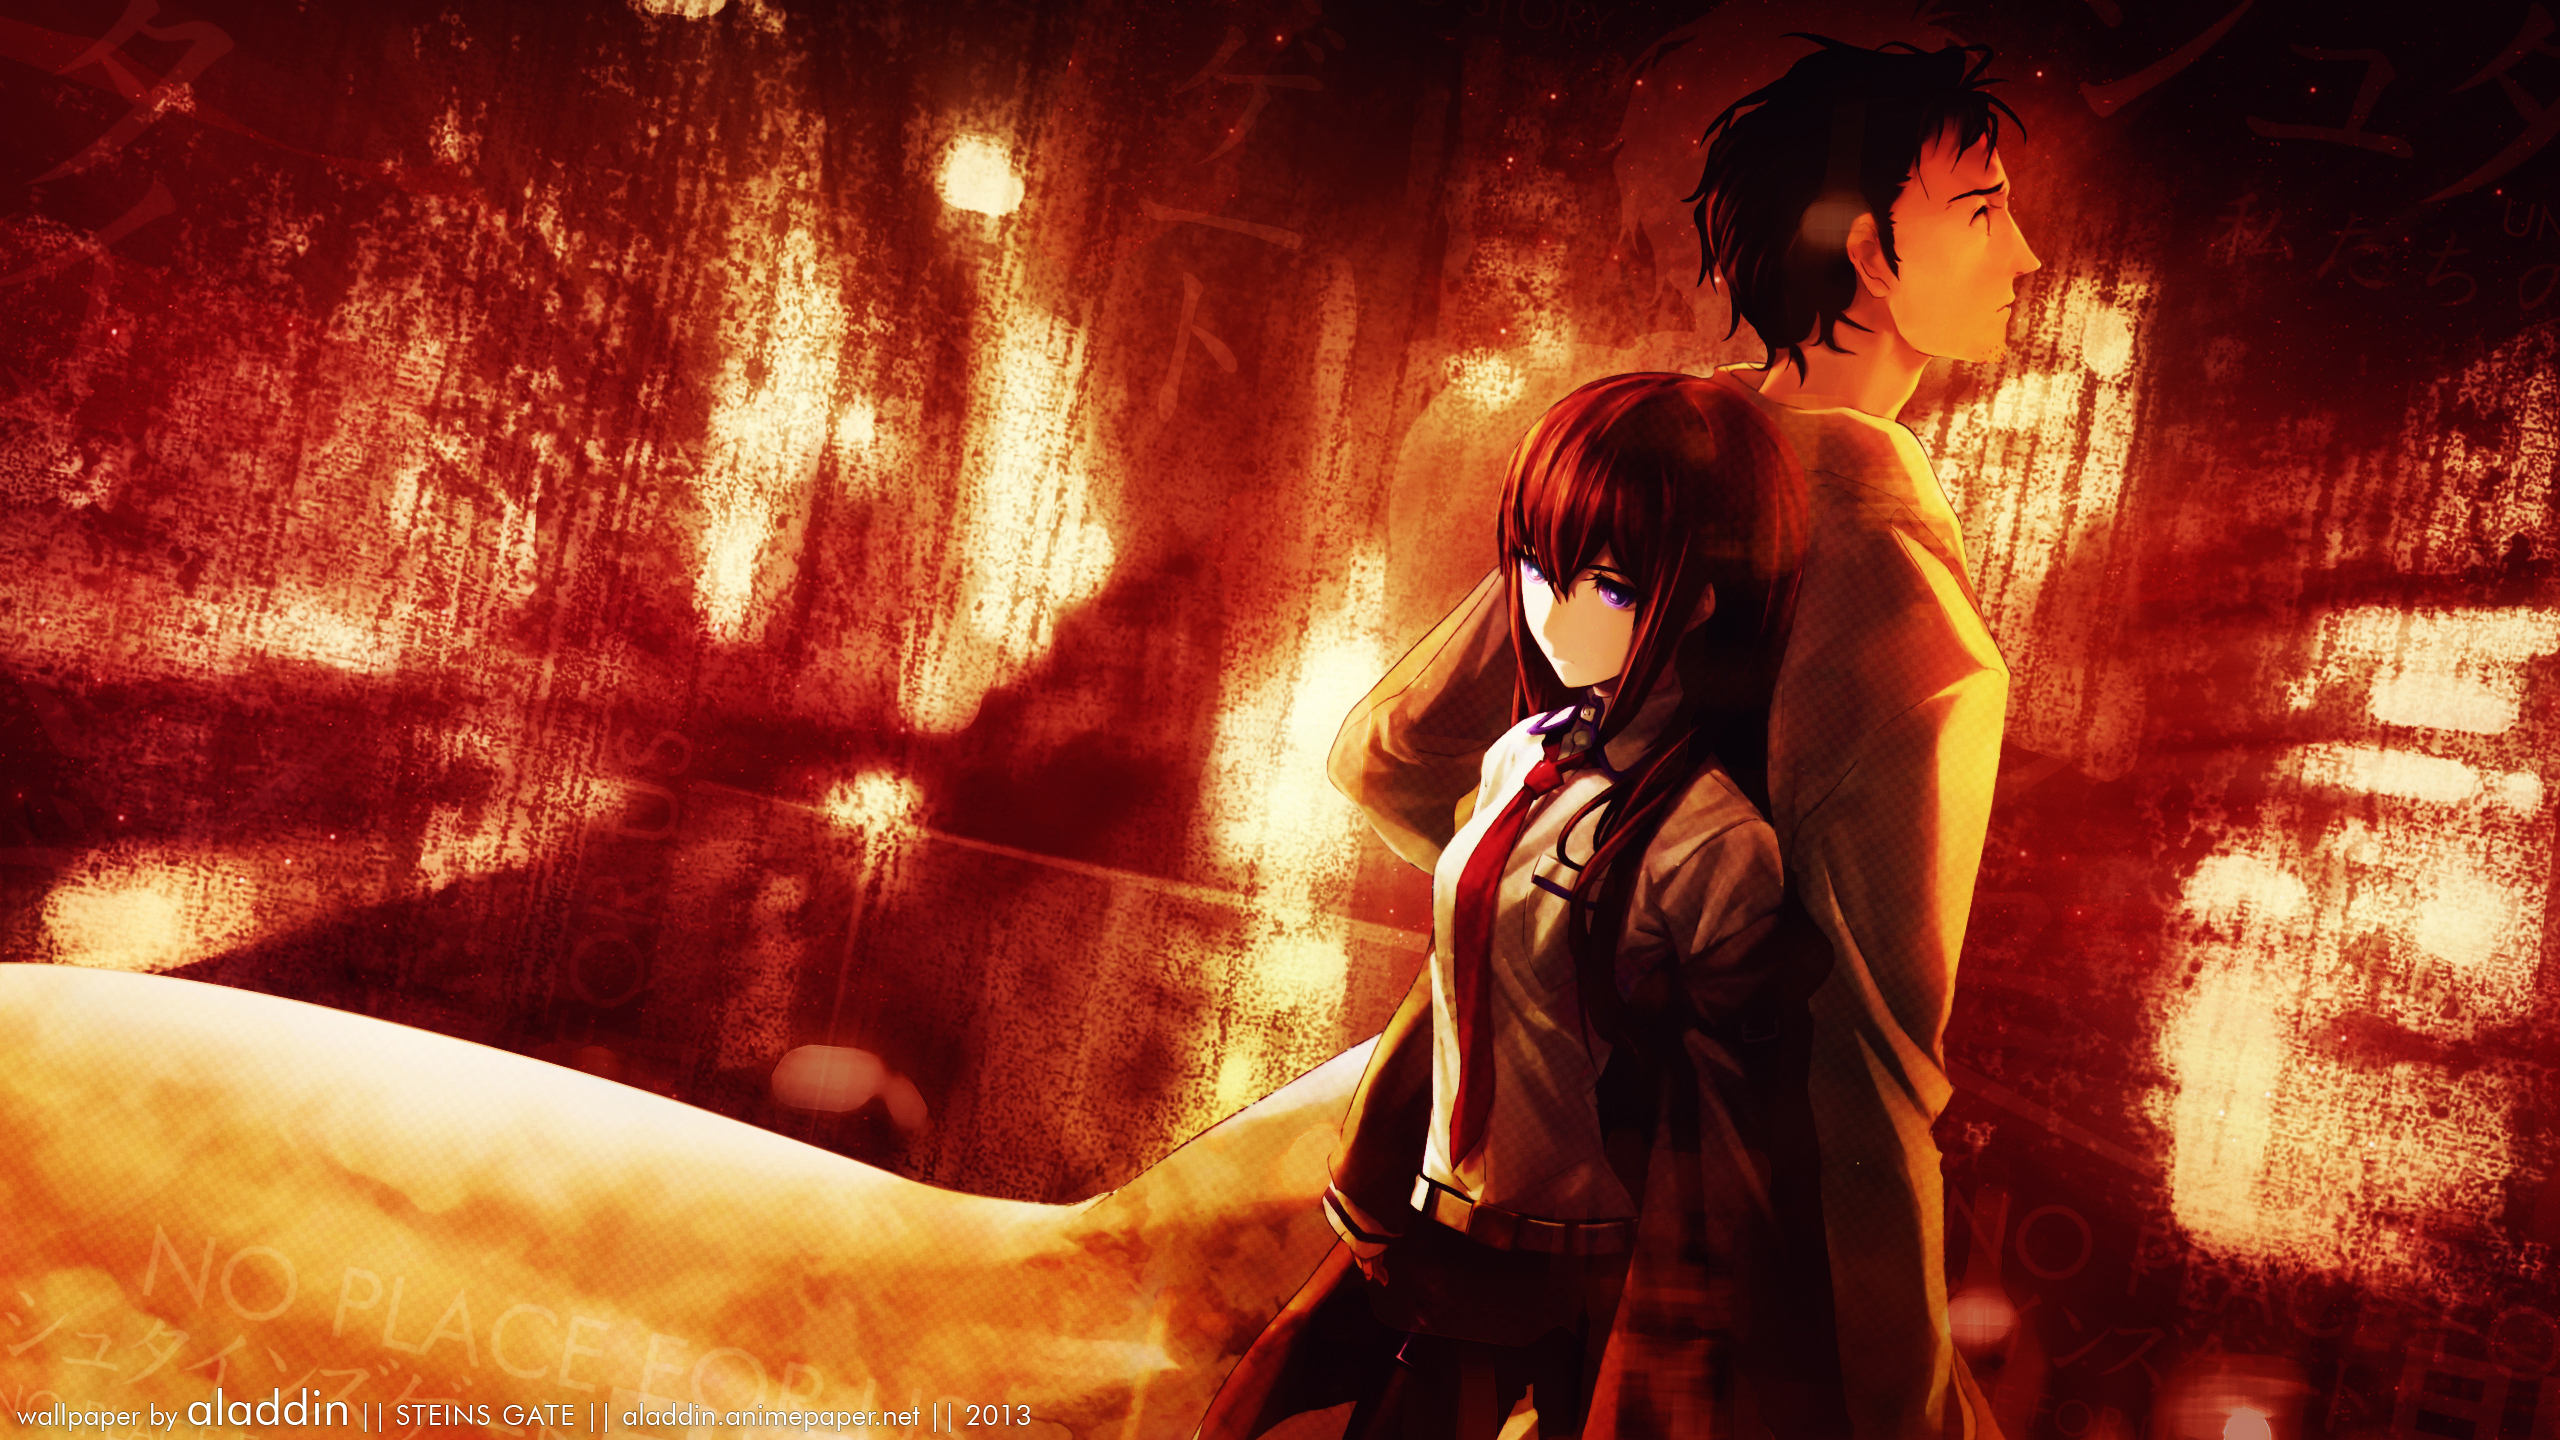 Makise Kurisu & Rintaro Okabe Full HD Wallpaper and ...